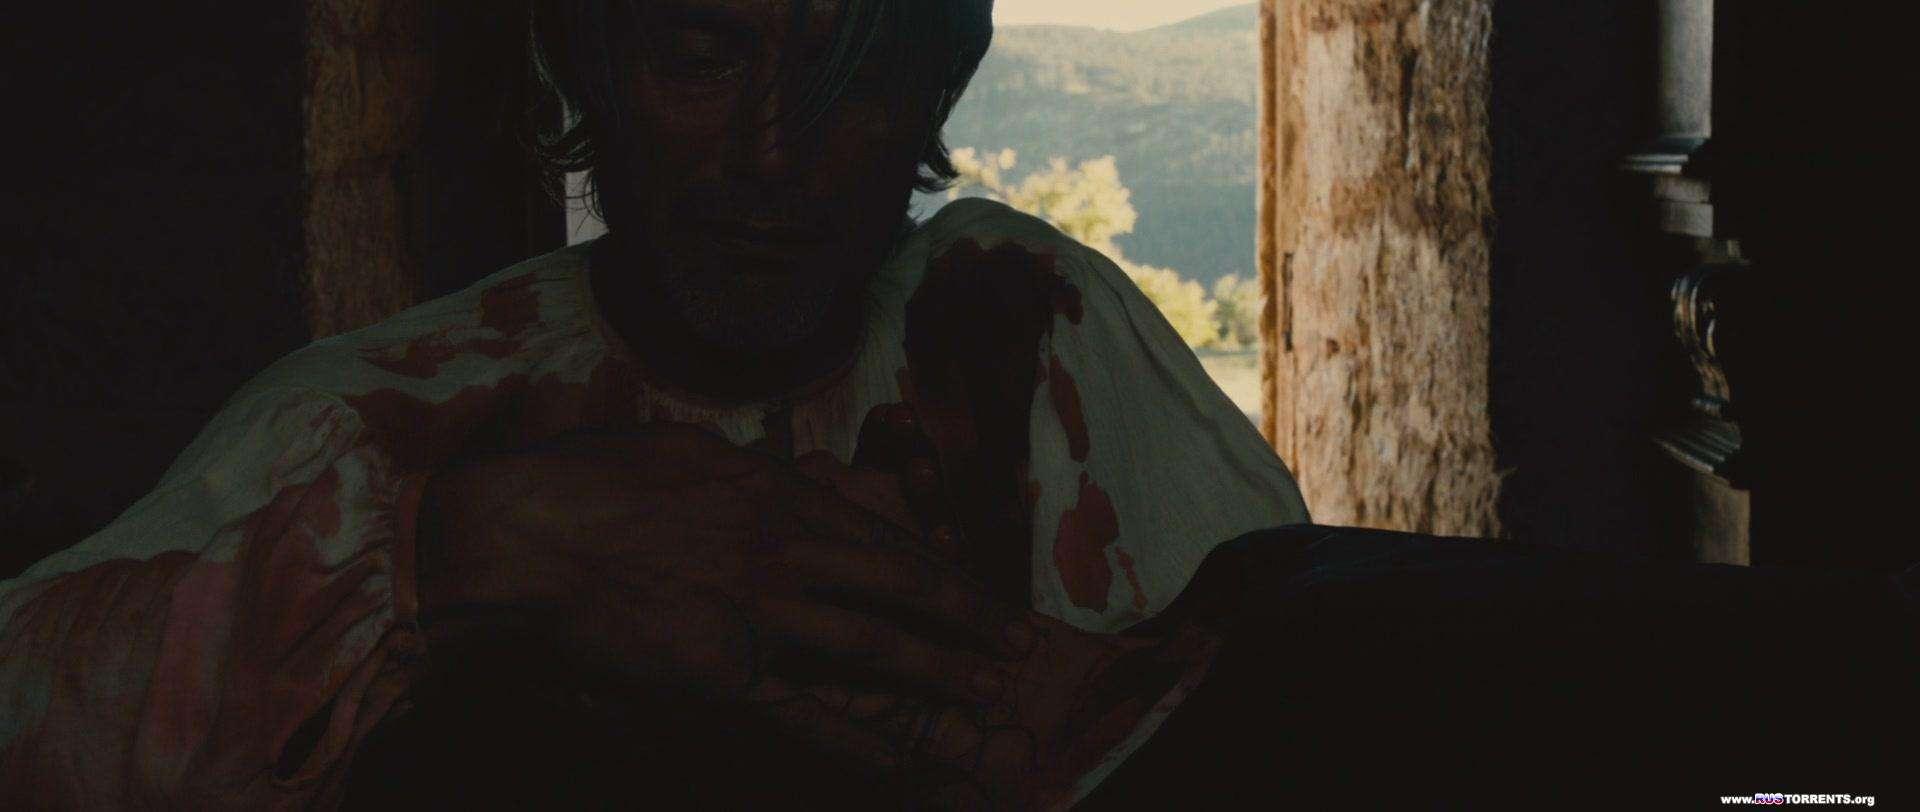 Михаэль Кольхаас | BDRip 1080p